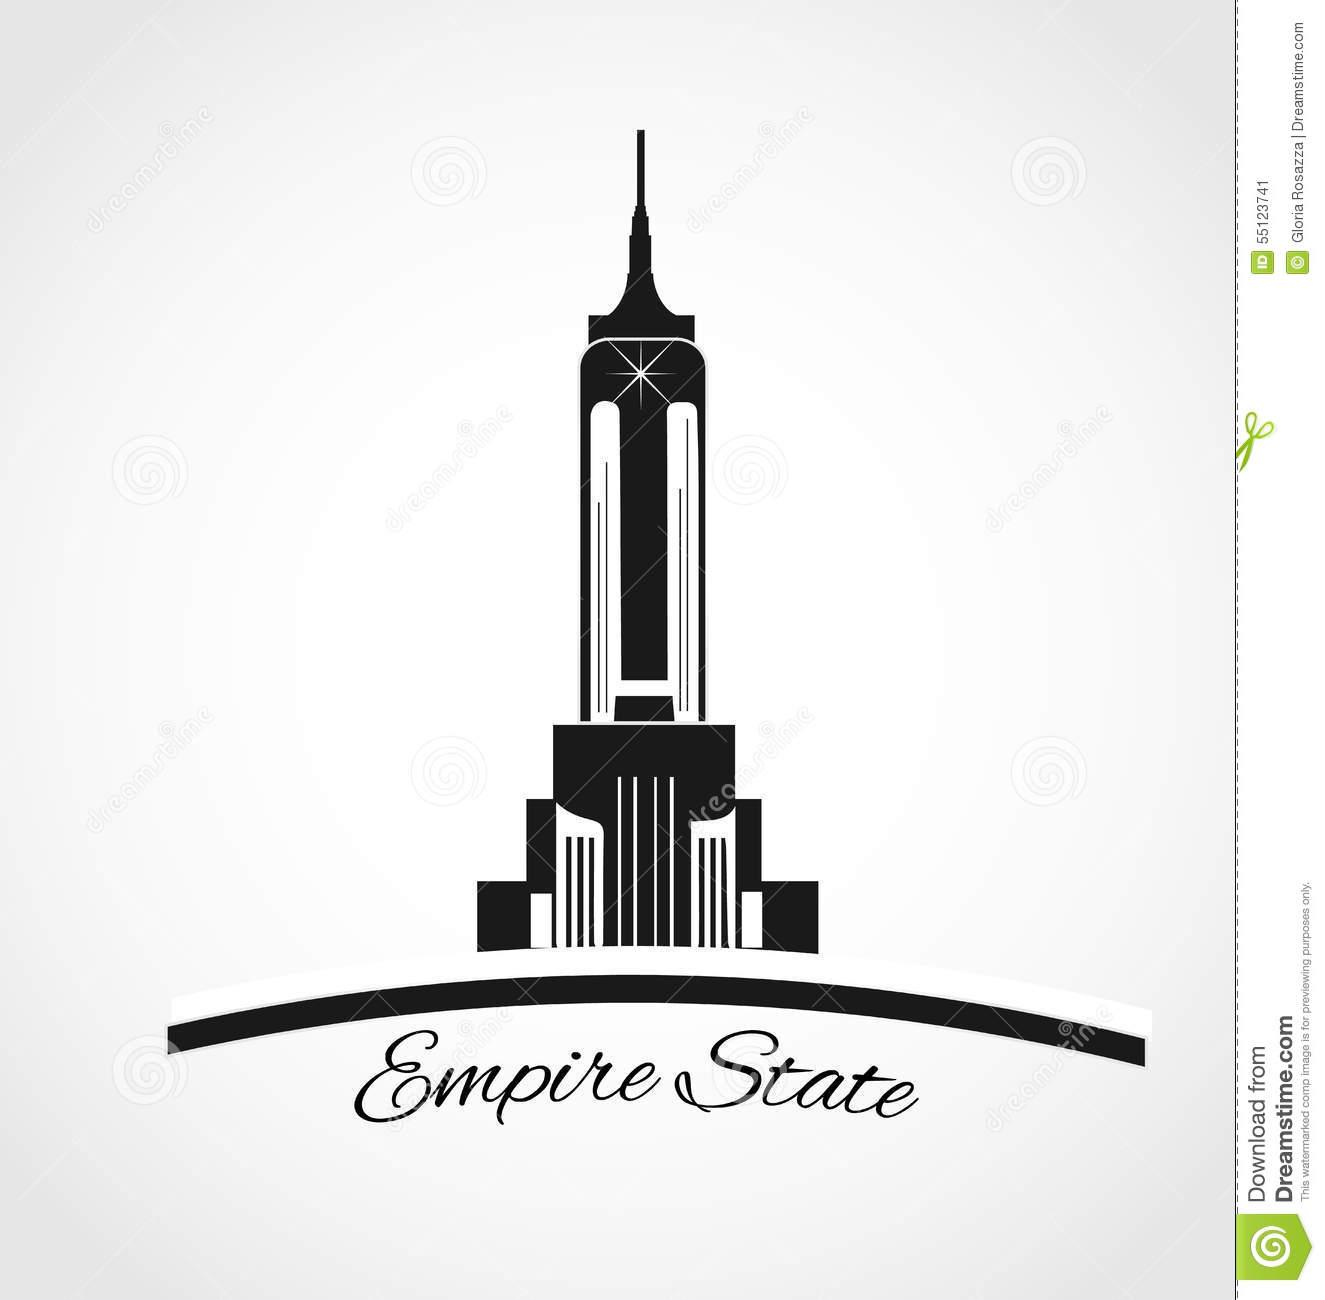 Empire State Building Logo Stock Illustration.